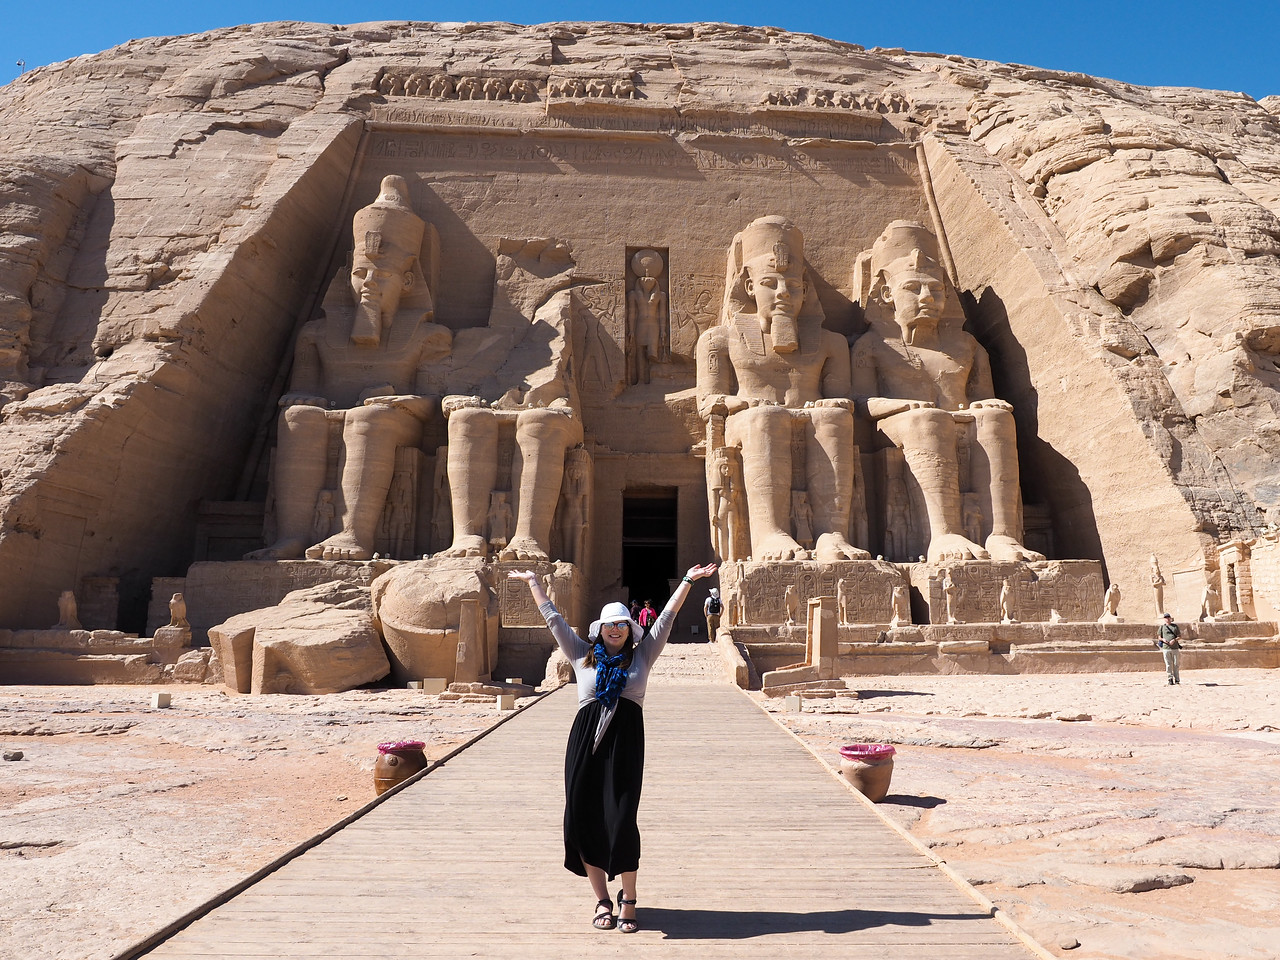 Amanda at Abu Simbel in Egypt